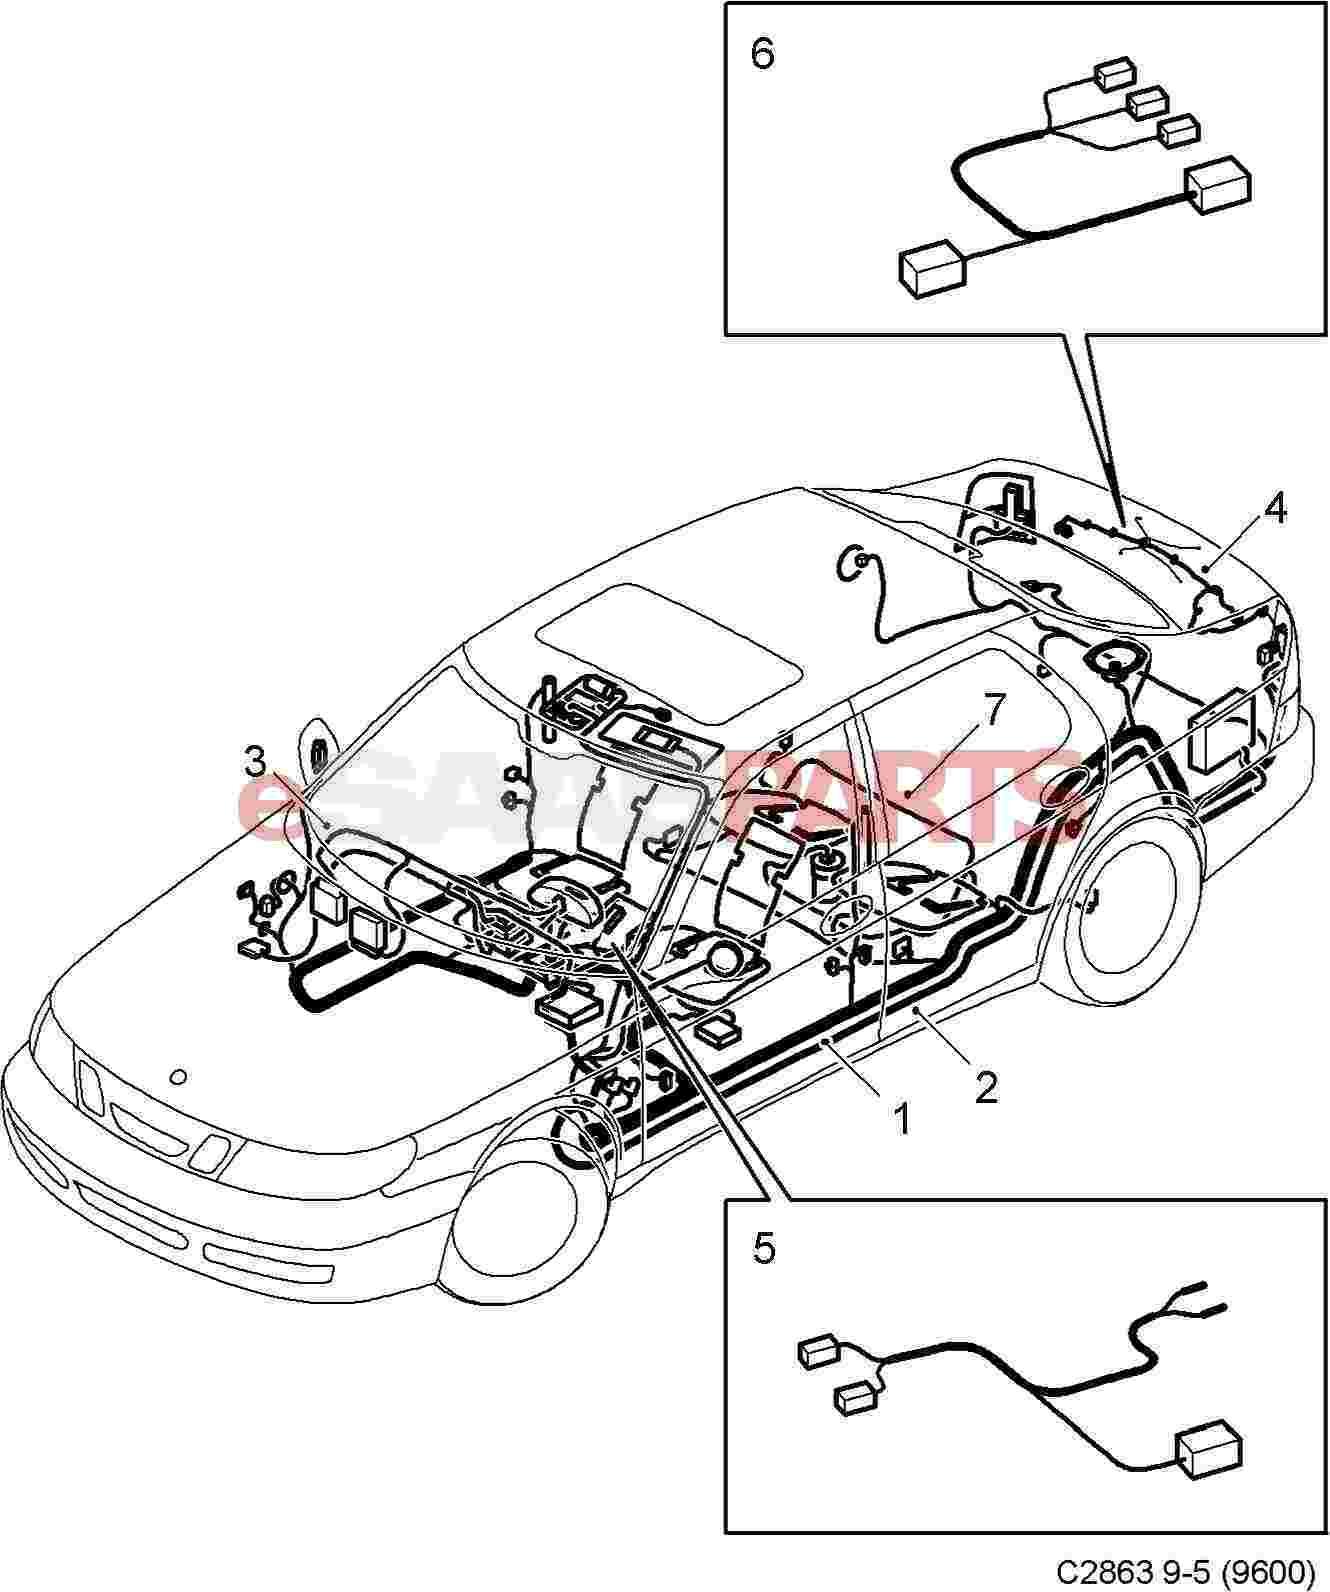 Esaabparts saab 9 5 9600 > electrical parts > wiring harness > rear